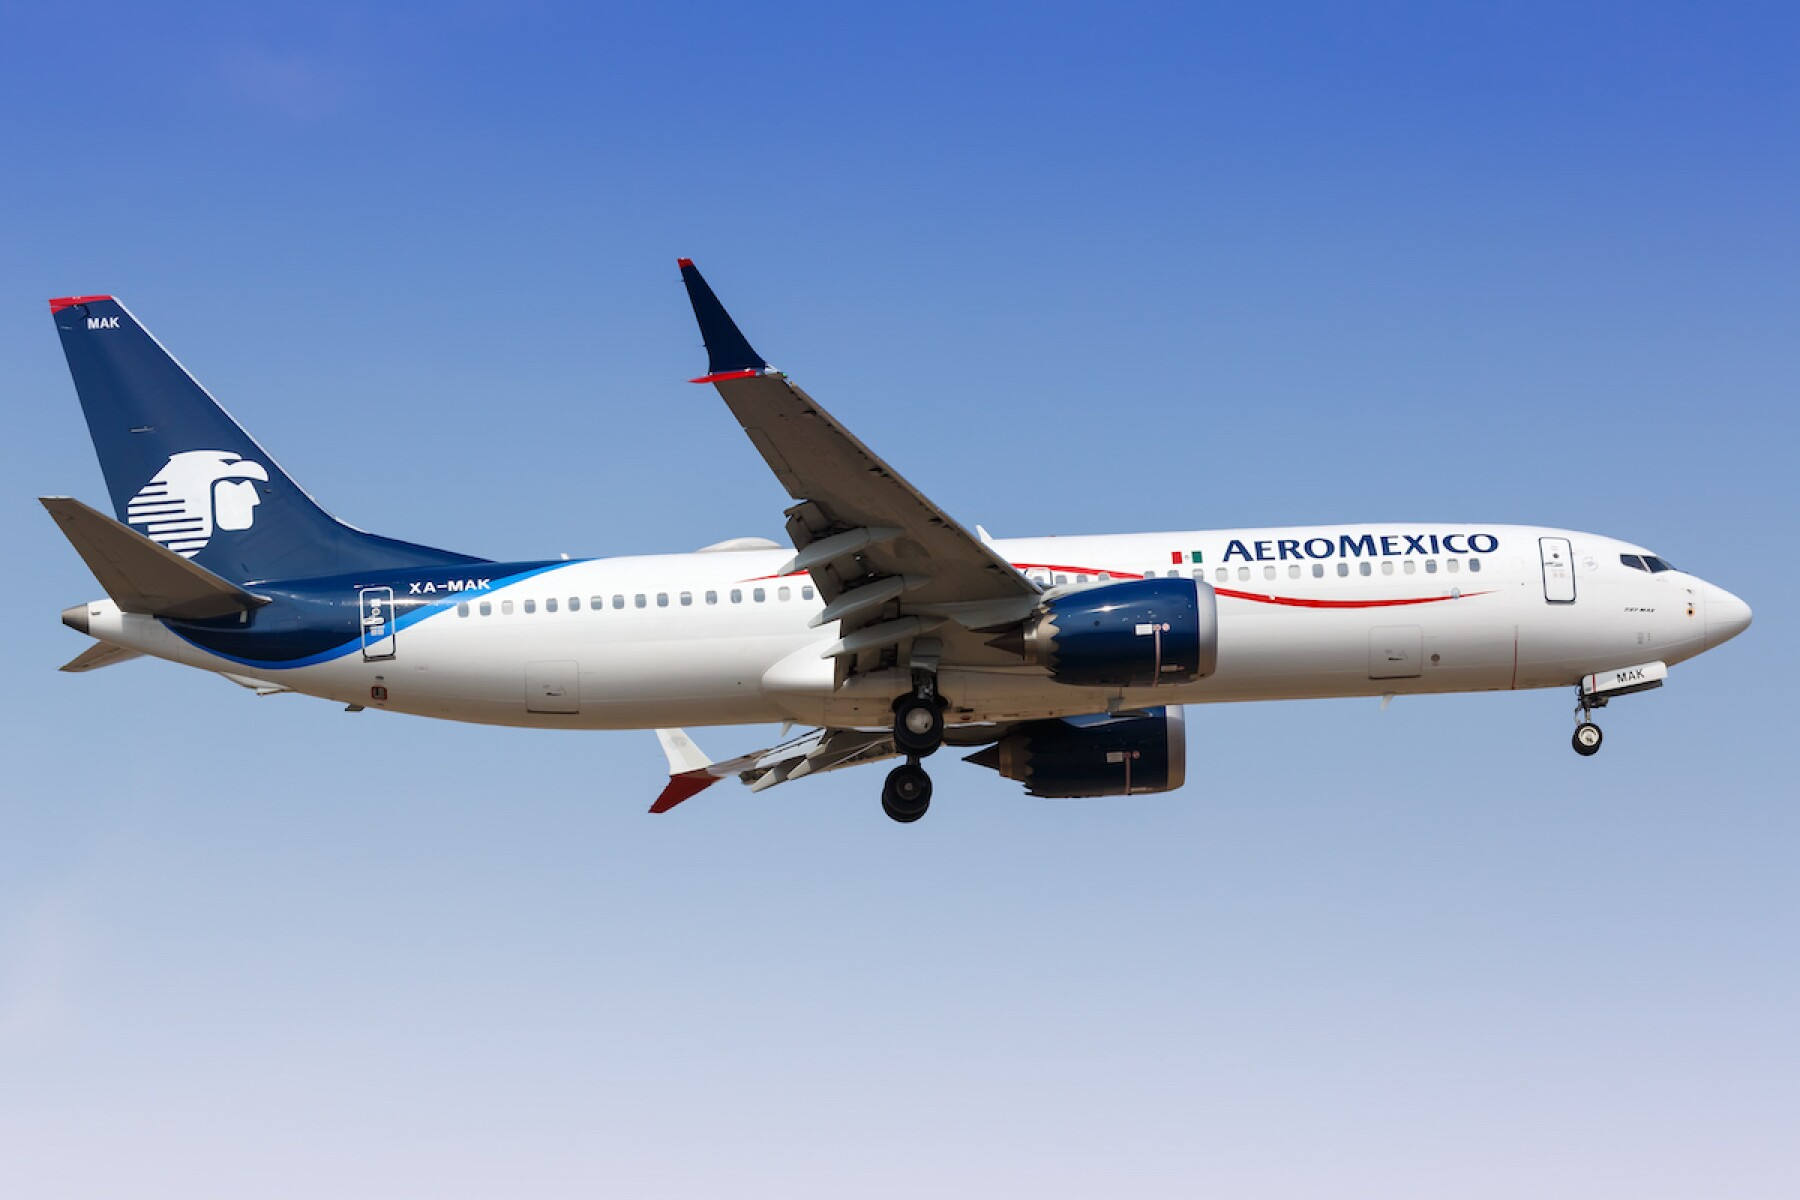 AeroMexico Boeing 737-8 MAX airplane